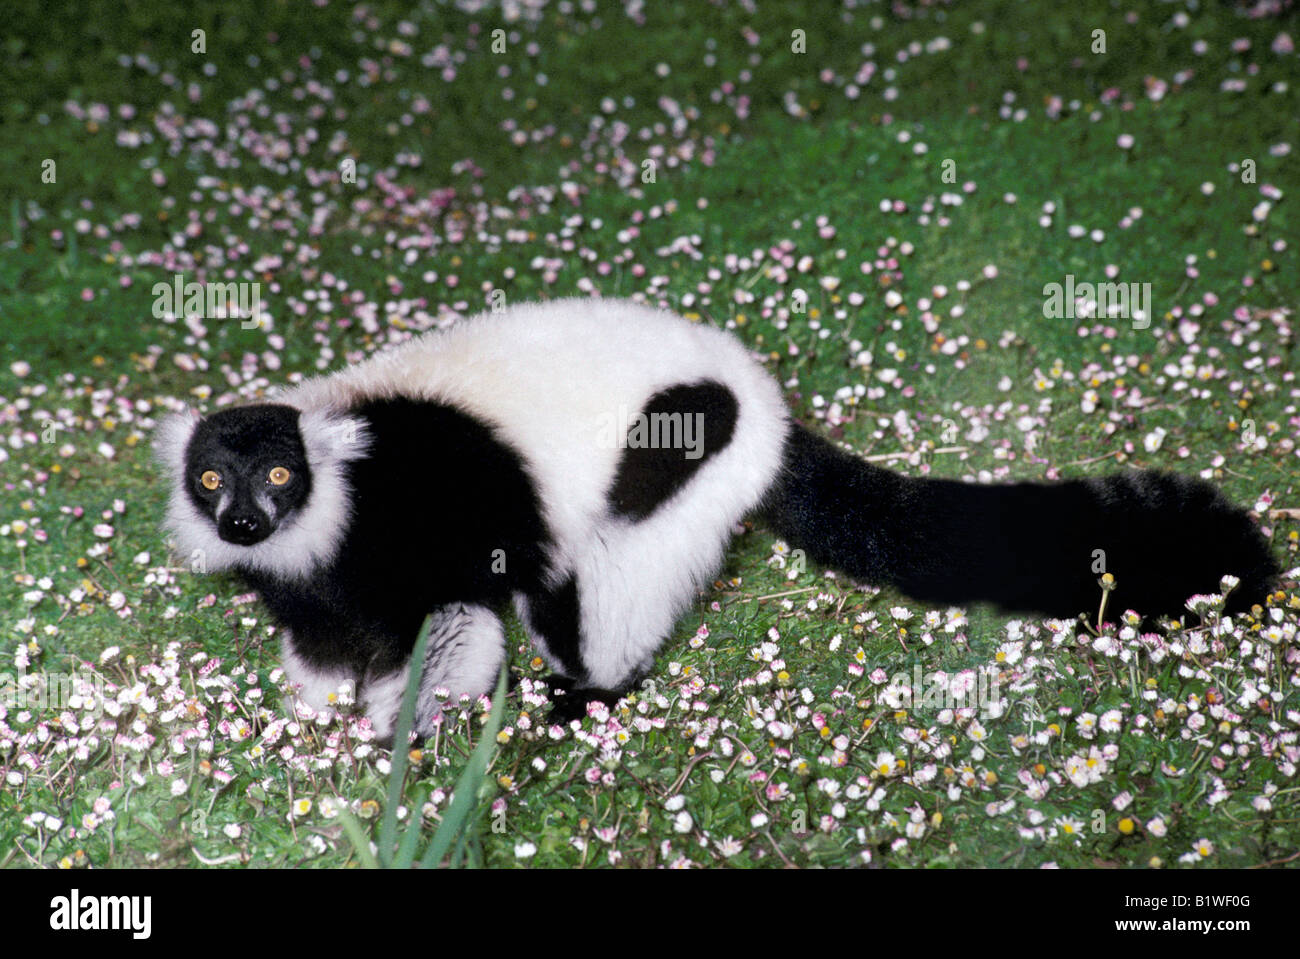 Bianco e nero lemure Ruffed Varecia variegata variegata Schwarz weisser Vari lato Madagascar Le mur variegatus Varecia Foto Stock